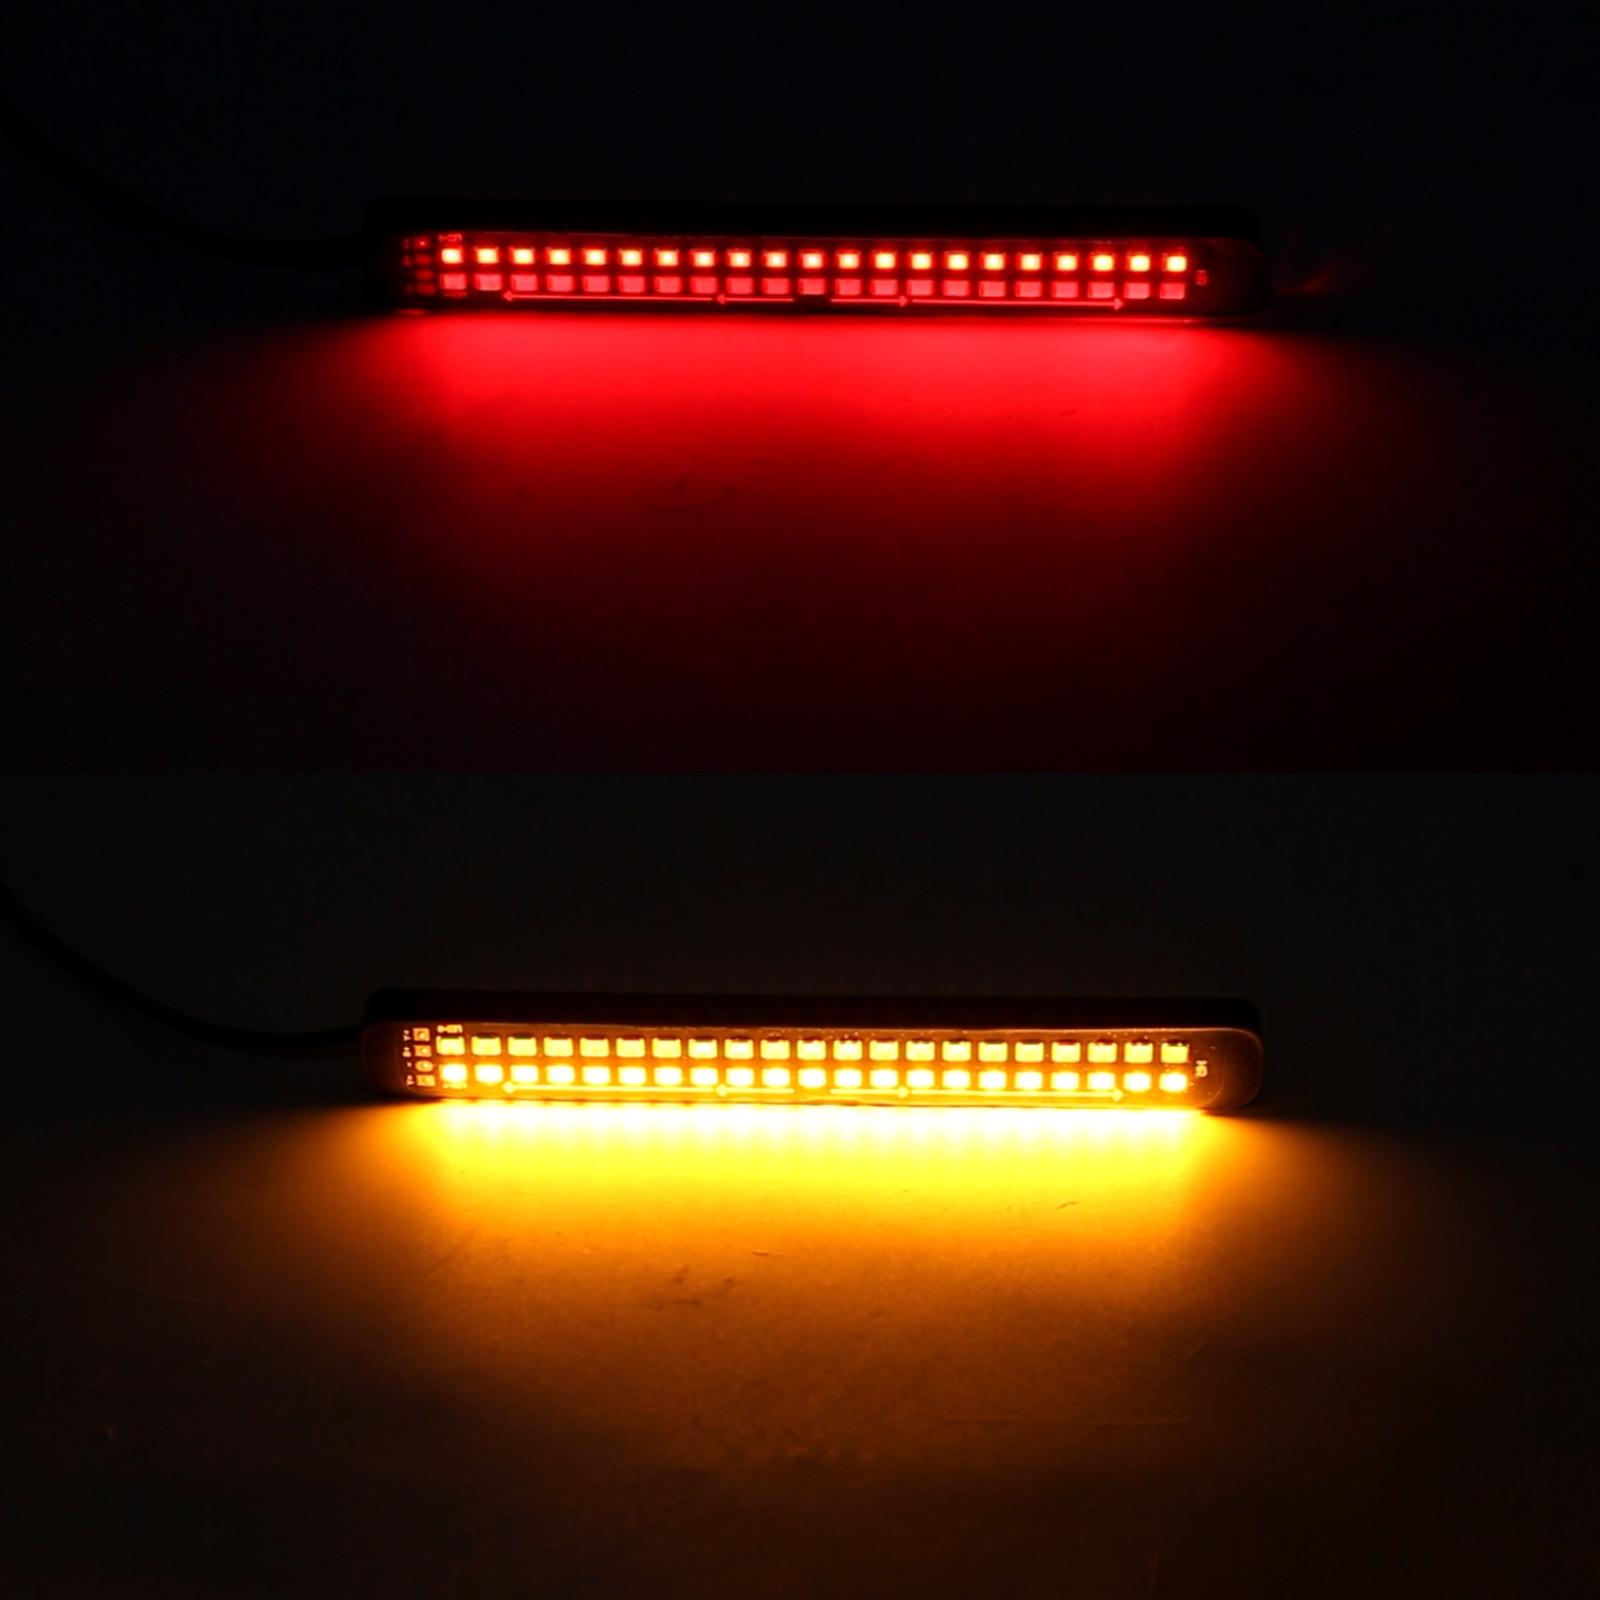 155mm DC12-24V / 2.2W Motorcycle LED Dynamic Blinker Side Lights Flowing Water Brake Lamp Turn Signal Light, Cable Length: 1m